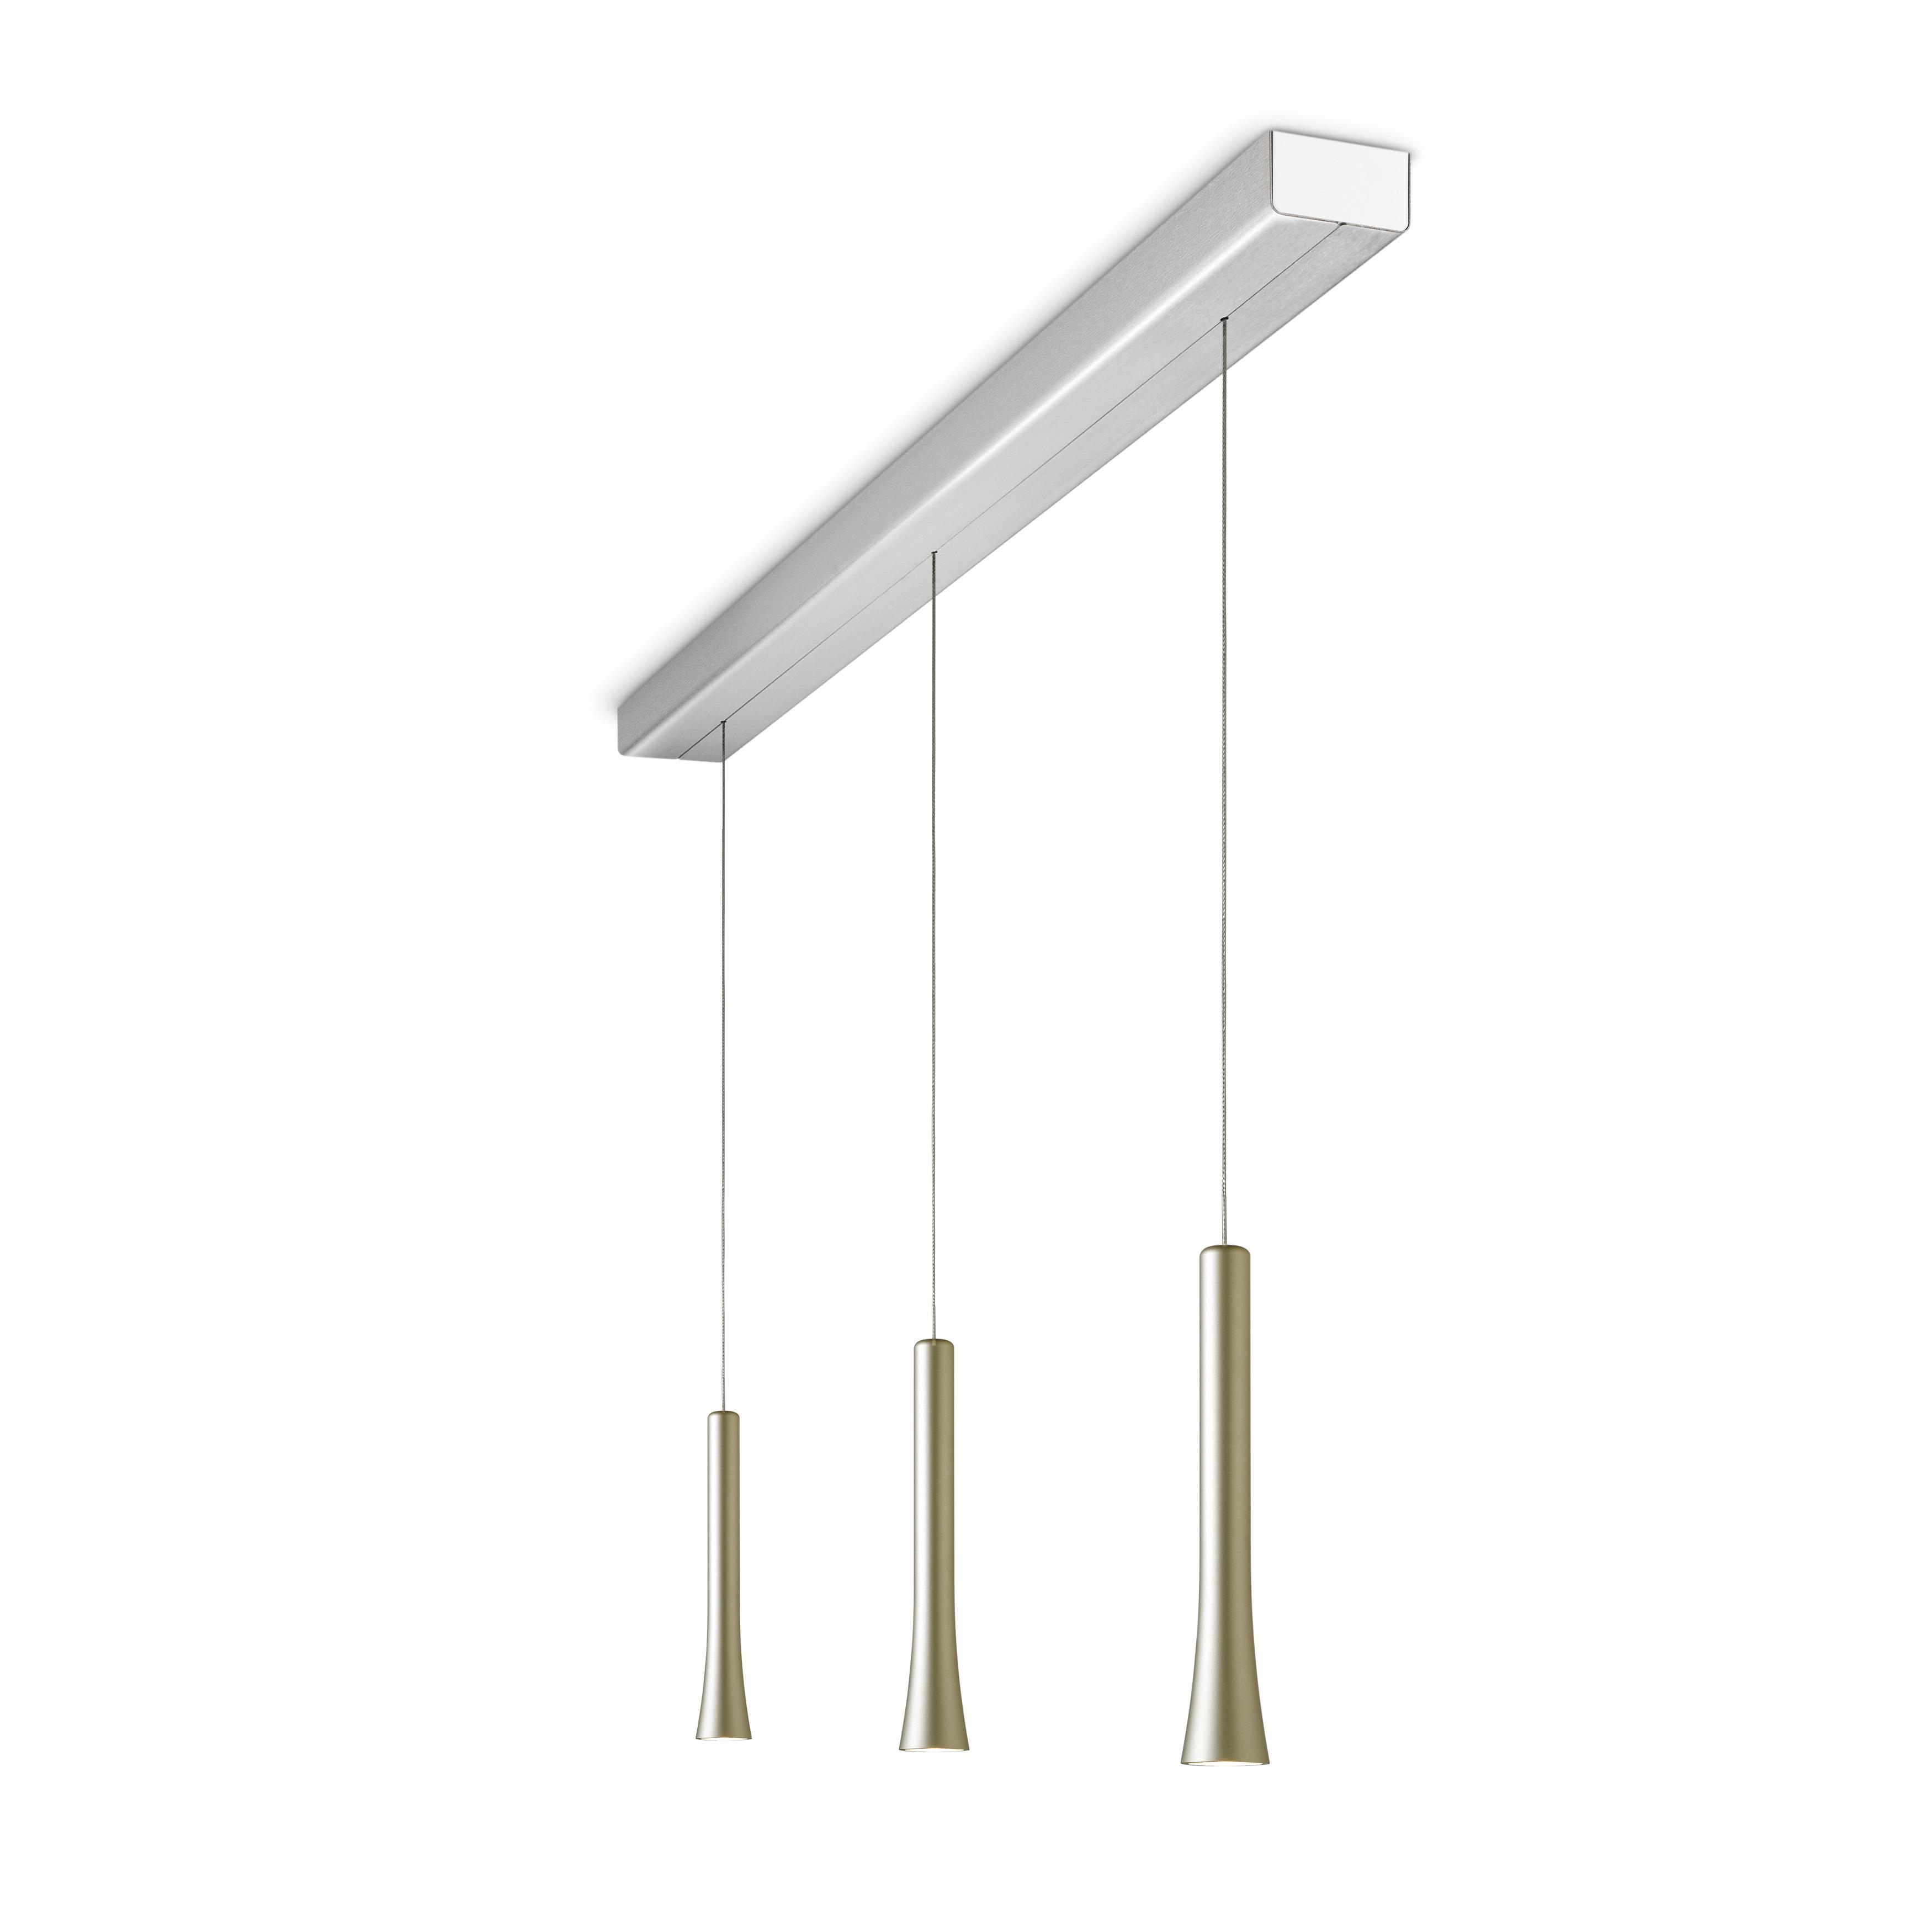 Rio Pendelleuchte mit Kabelzug 3-flammig modular, pearl silver